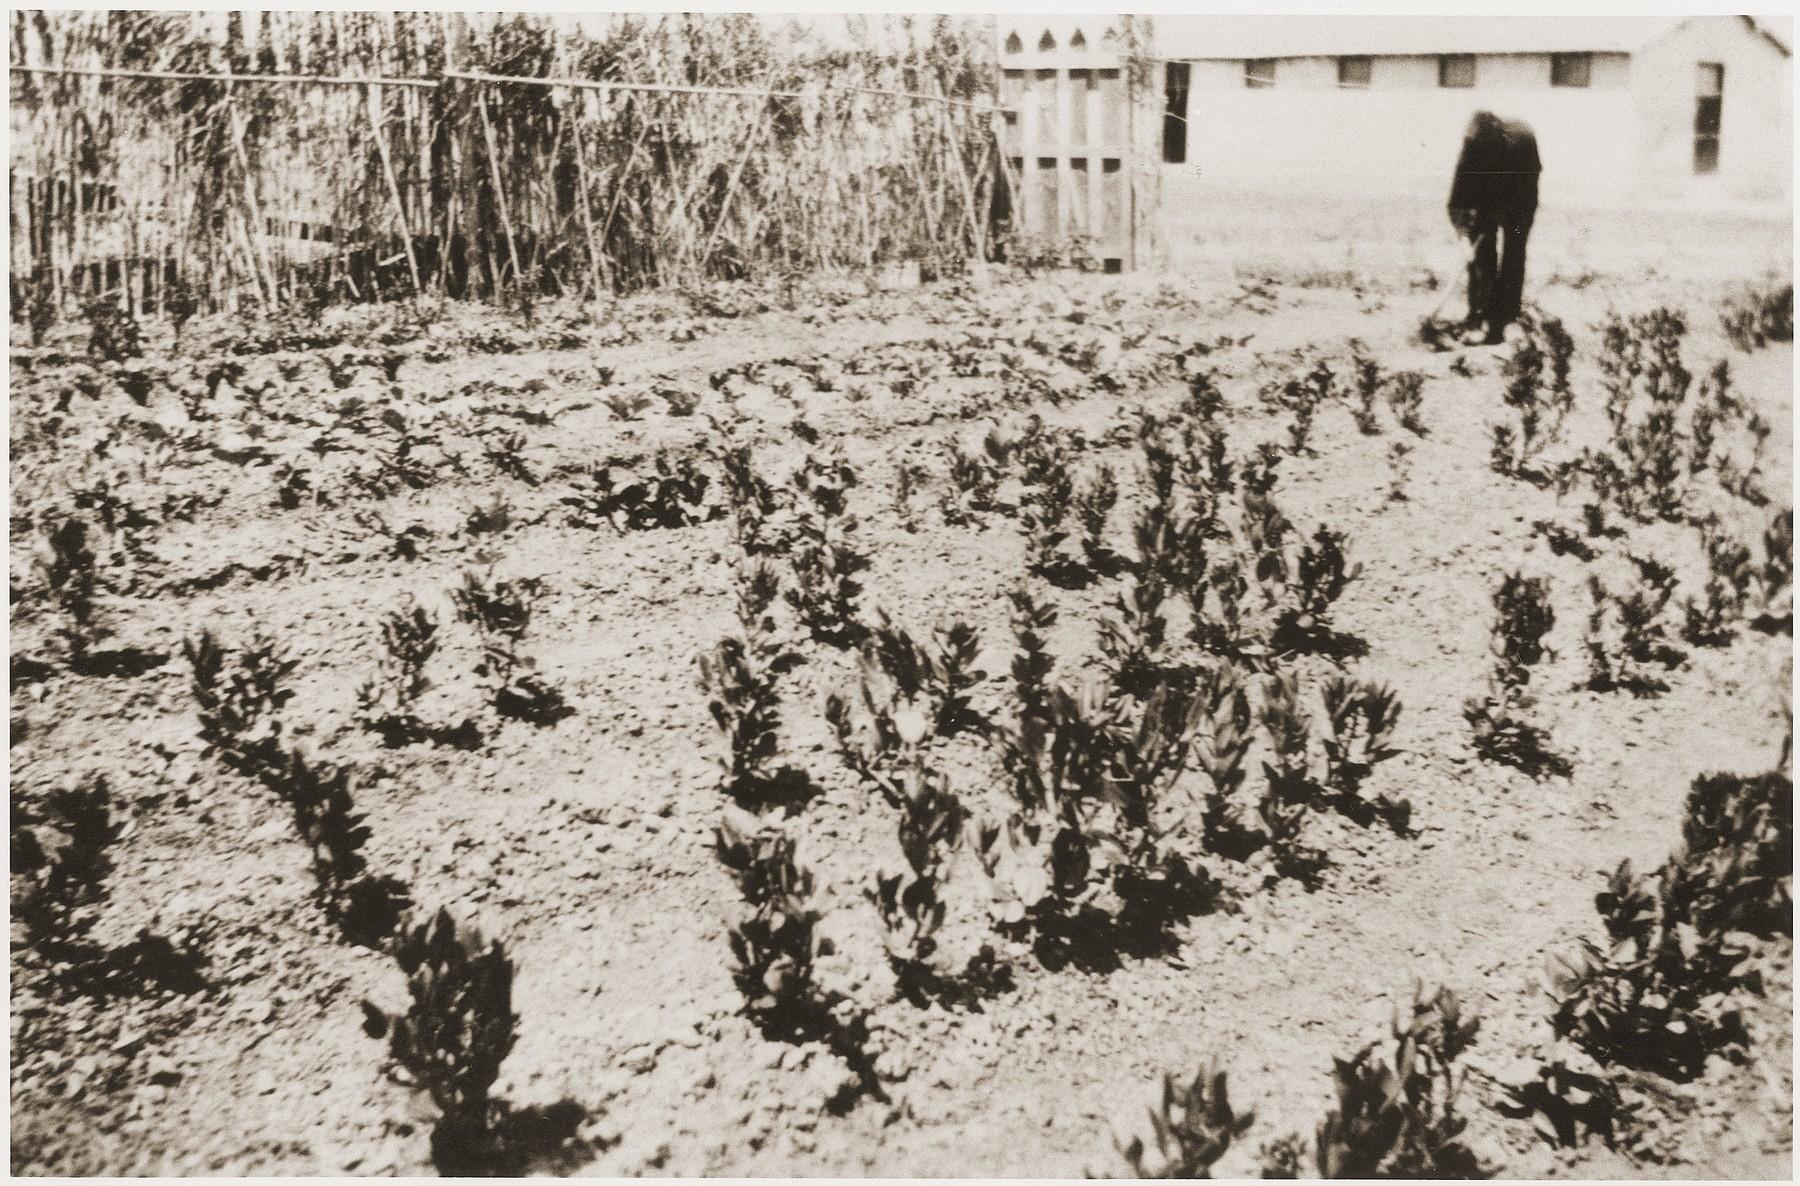 Garden belonging to Secours Suisse aux enfants in the Rivesaltes internment camp.